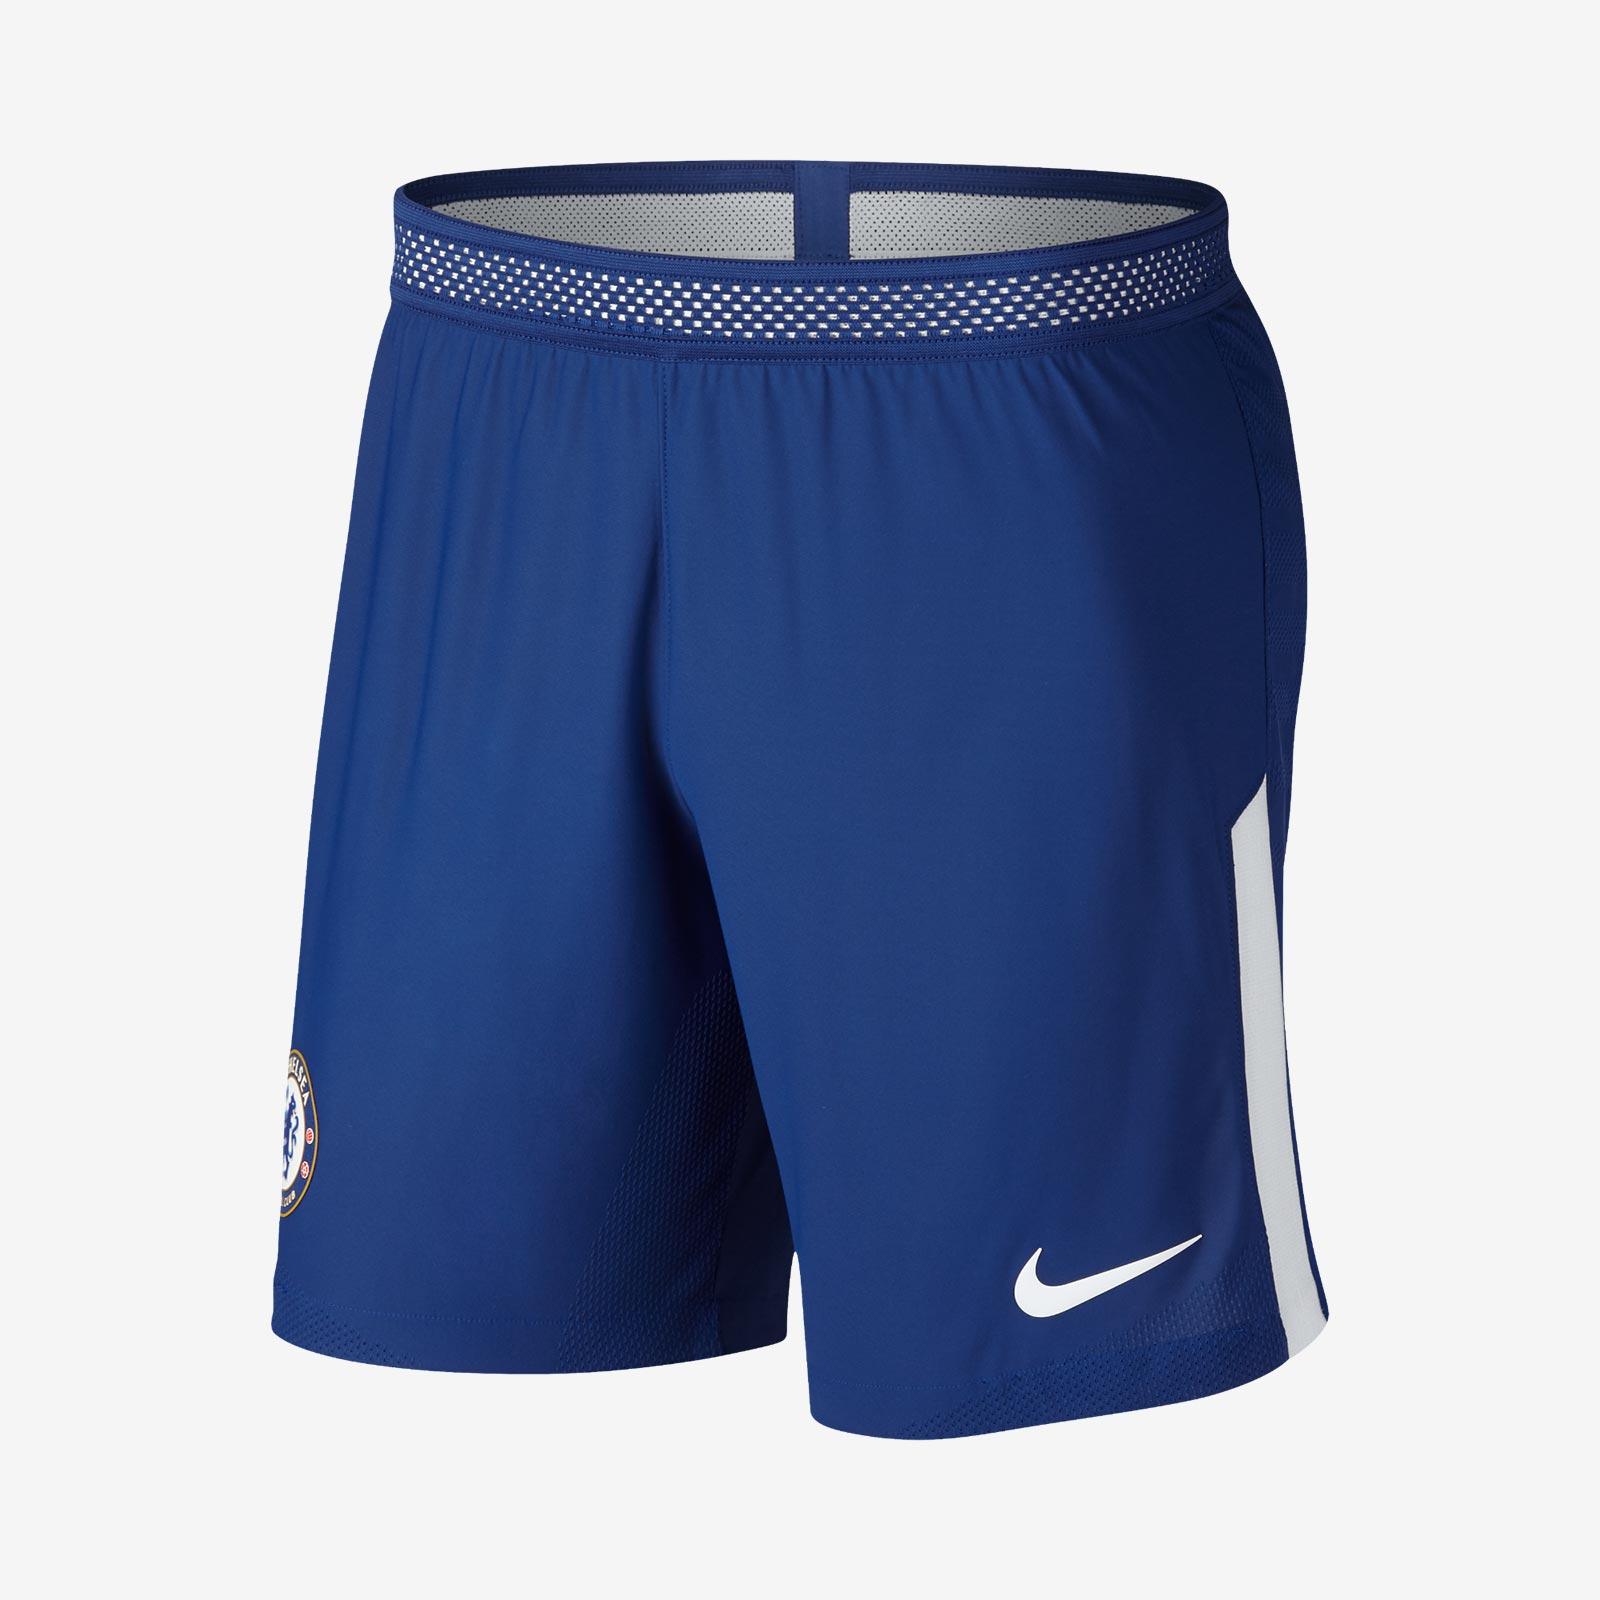 nike-chelsea-17-18-home-shorts